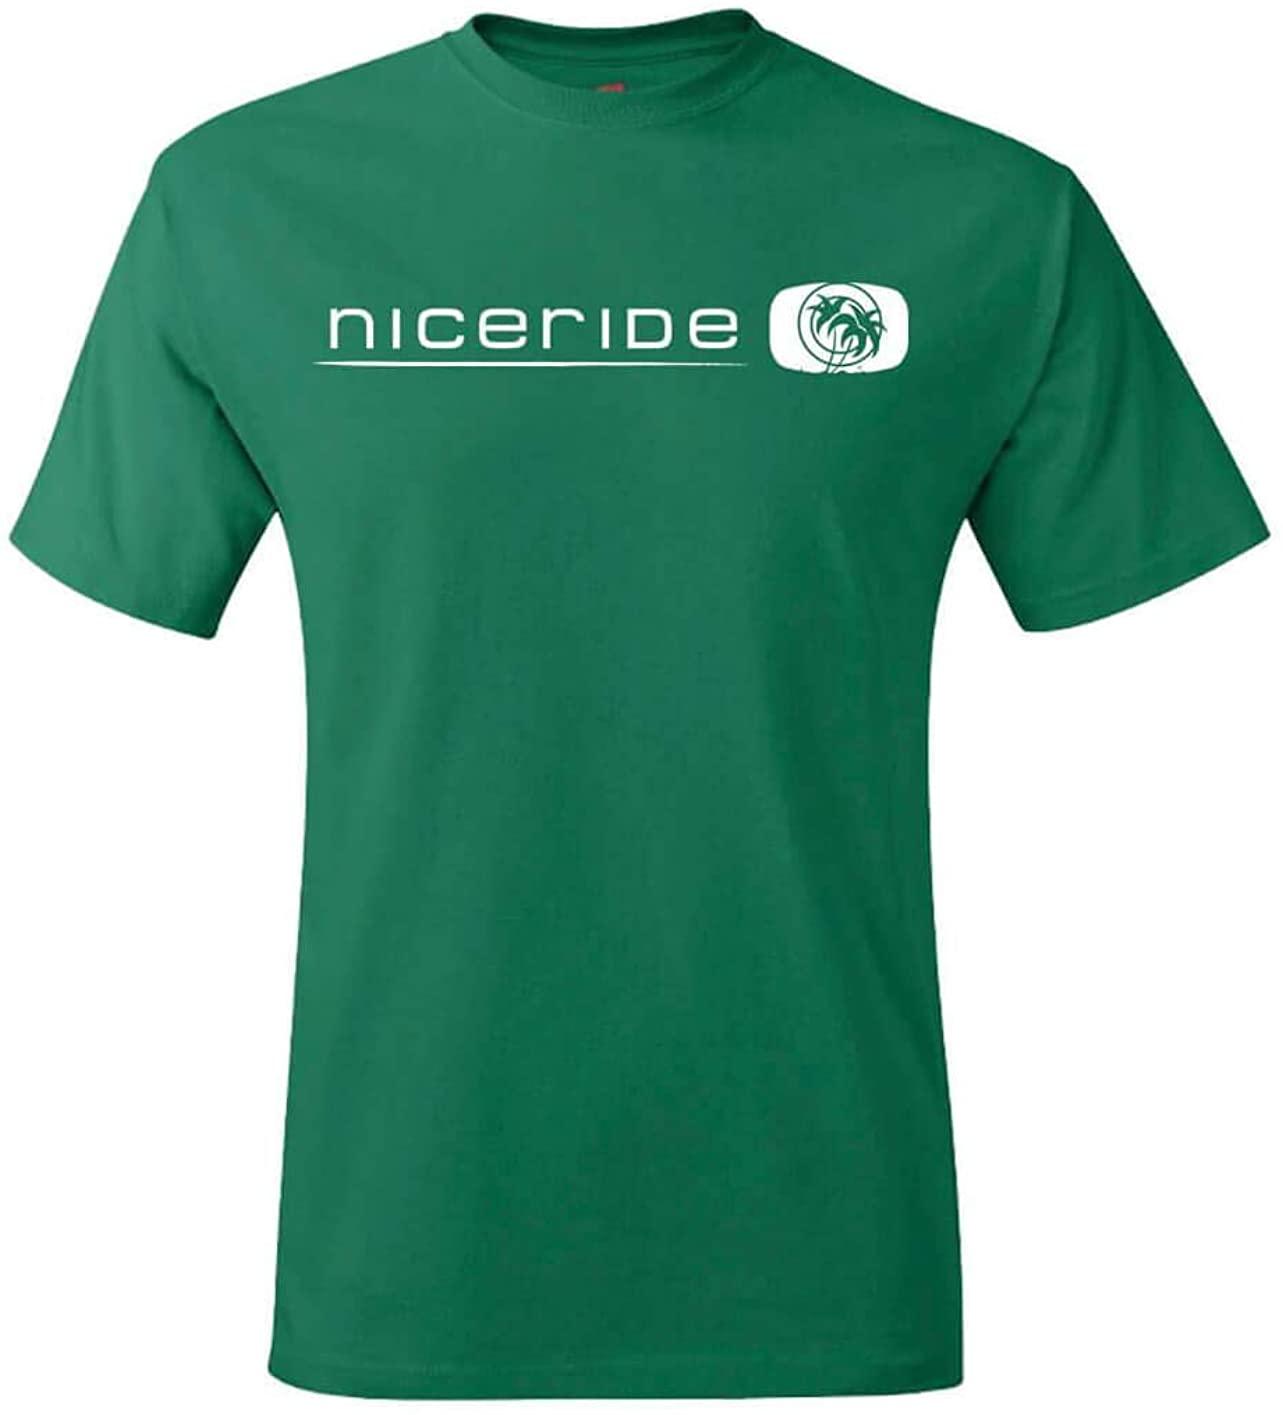 NICERIDE Above The Line - Men's T-Shirt